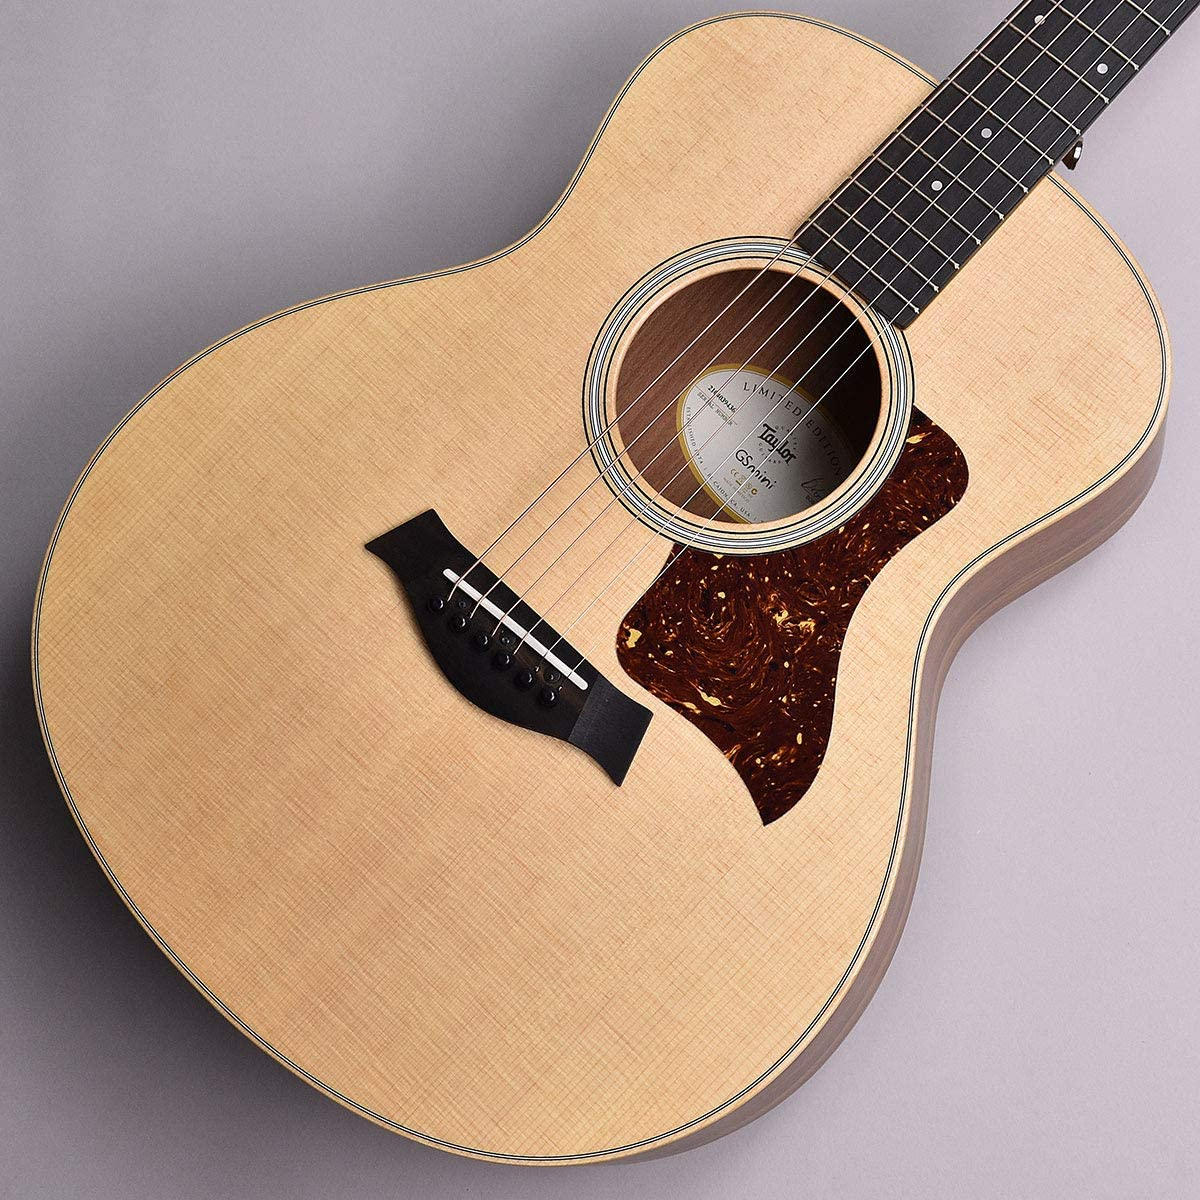 Taylor GS Mini-e Ovangkol Limited S/N:2104039436 ミニアコースティックギター【エレアコ】 テイラー